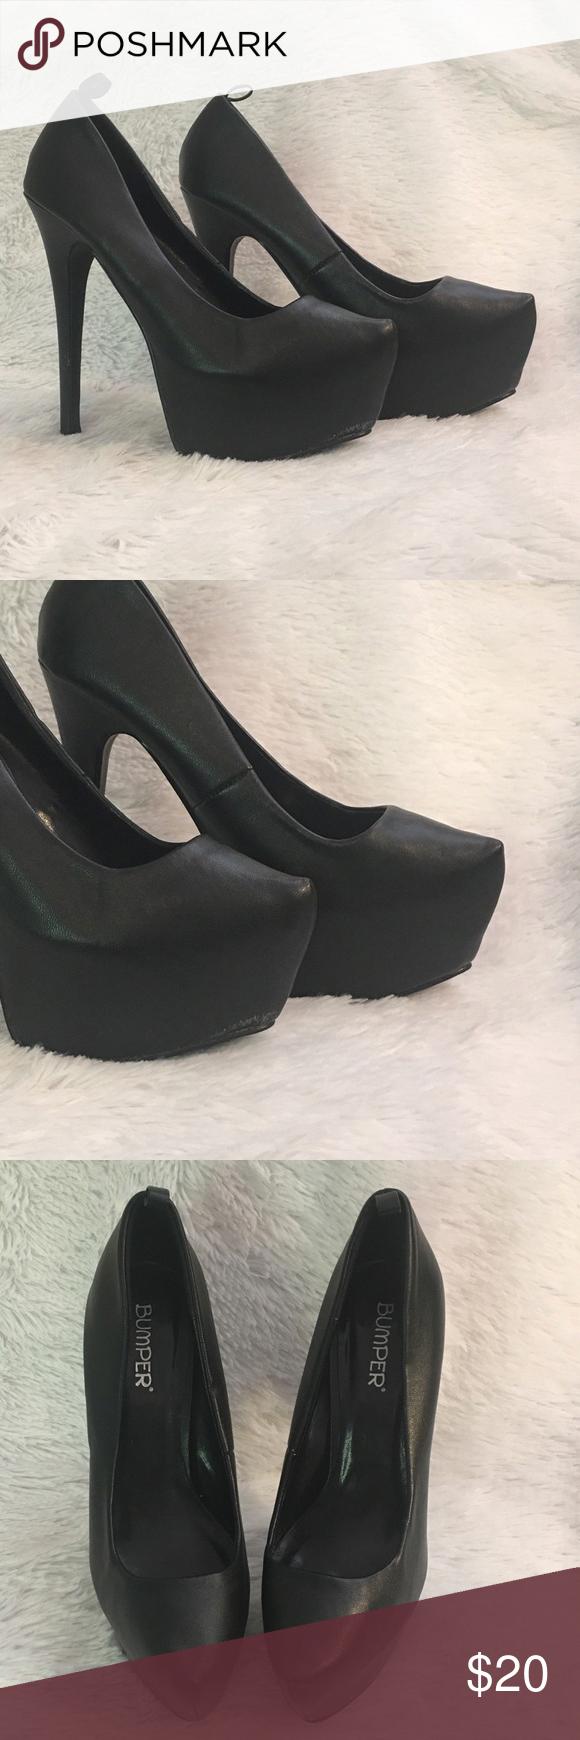 f20365d02f68 Bumper Black Pointy Toe Platform High Heel Bumper Elle12 Platform high heel  in great condition!